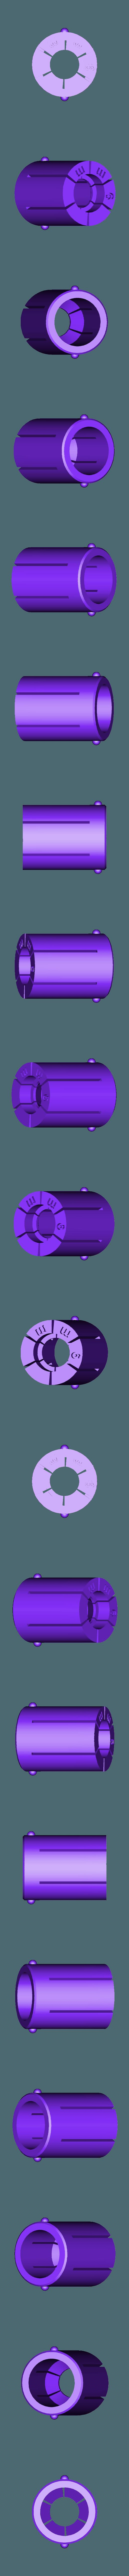 insert9mm.small.stl Download free STL file Bullet puller • 3D printable design, LionFox